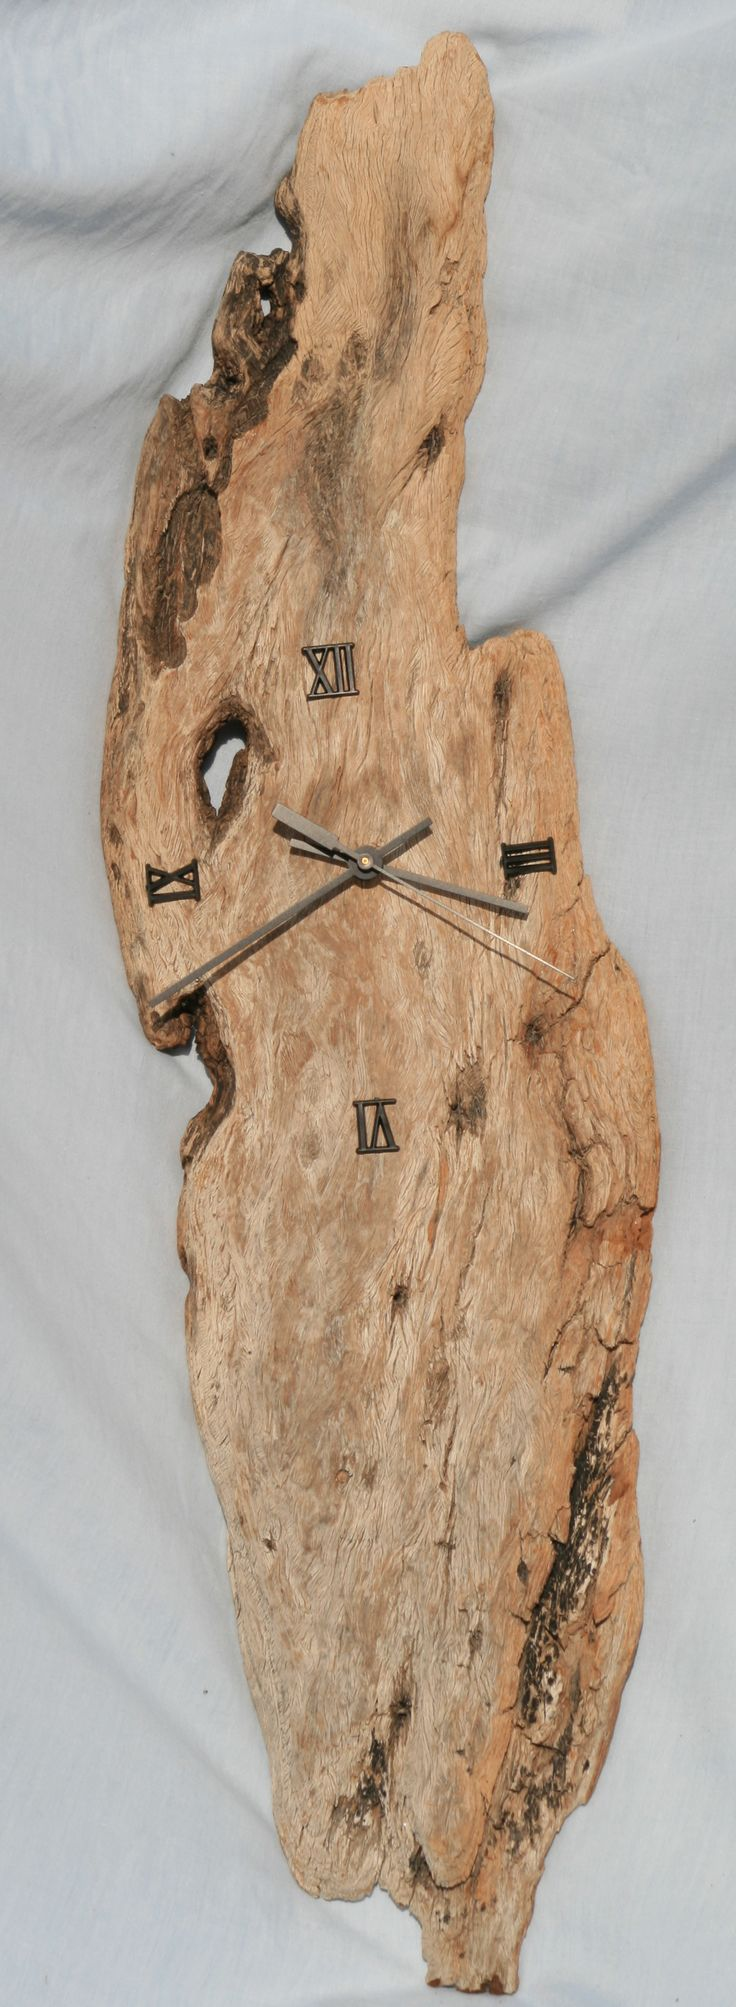 Driftwood Clock by Jan Dickers Ocean Art